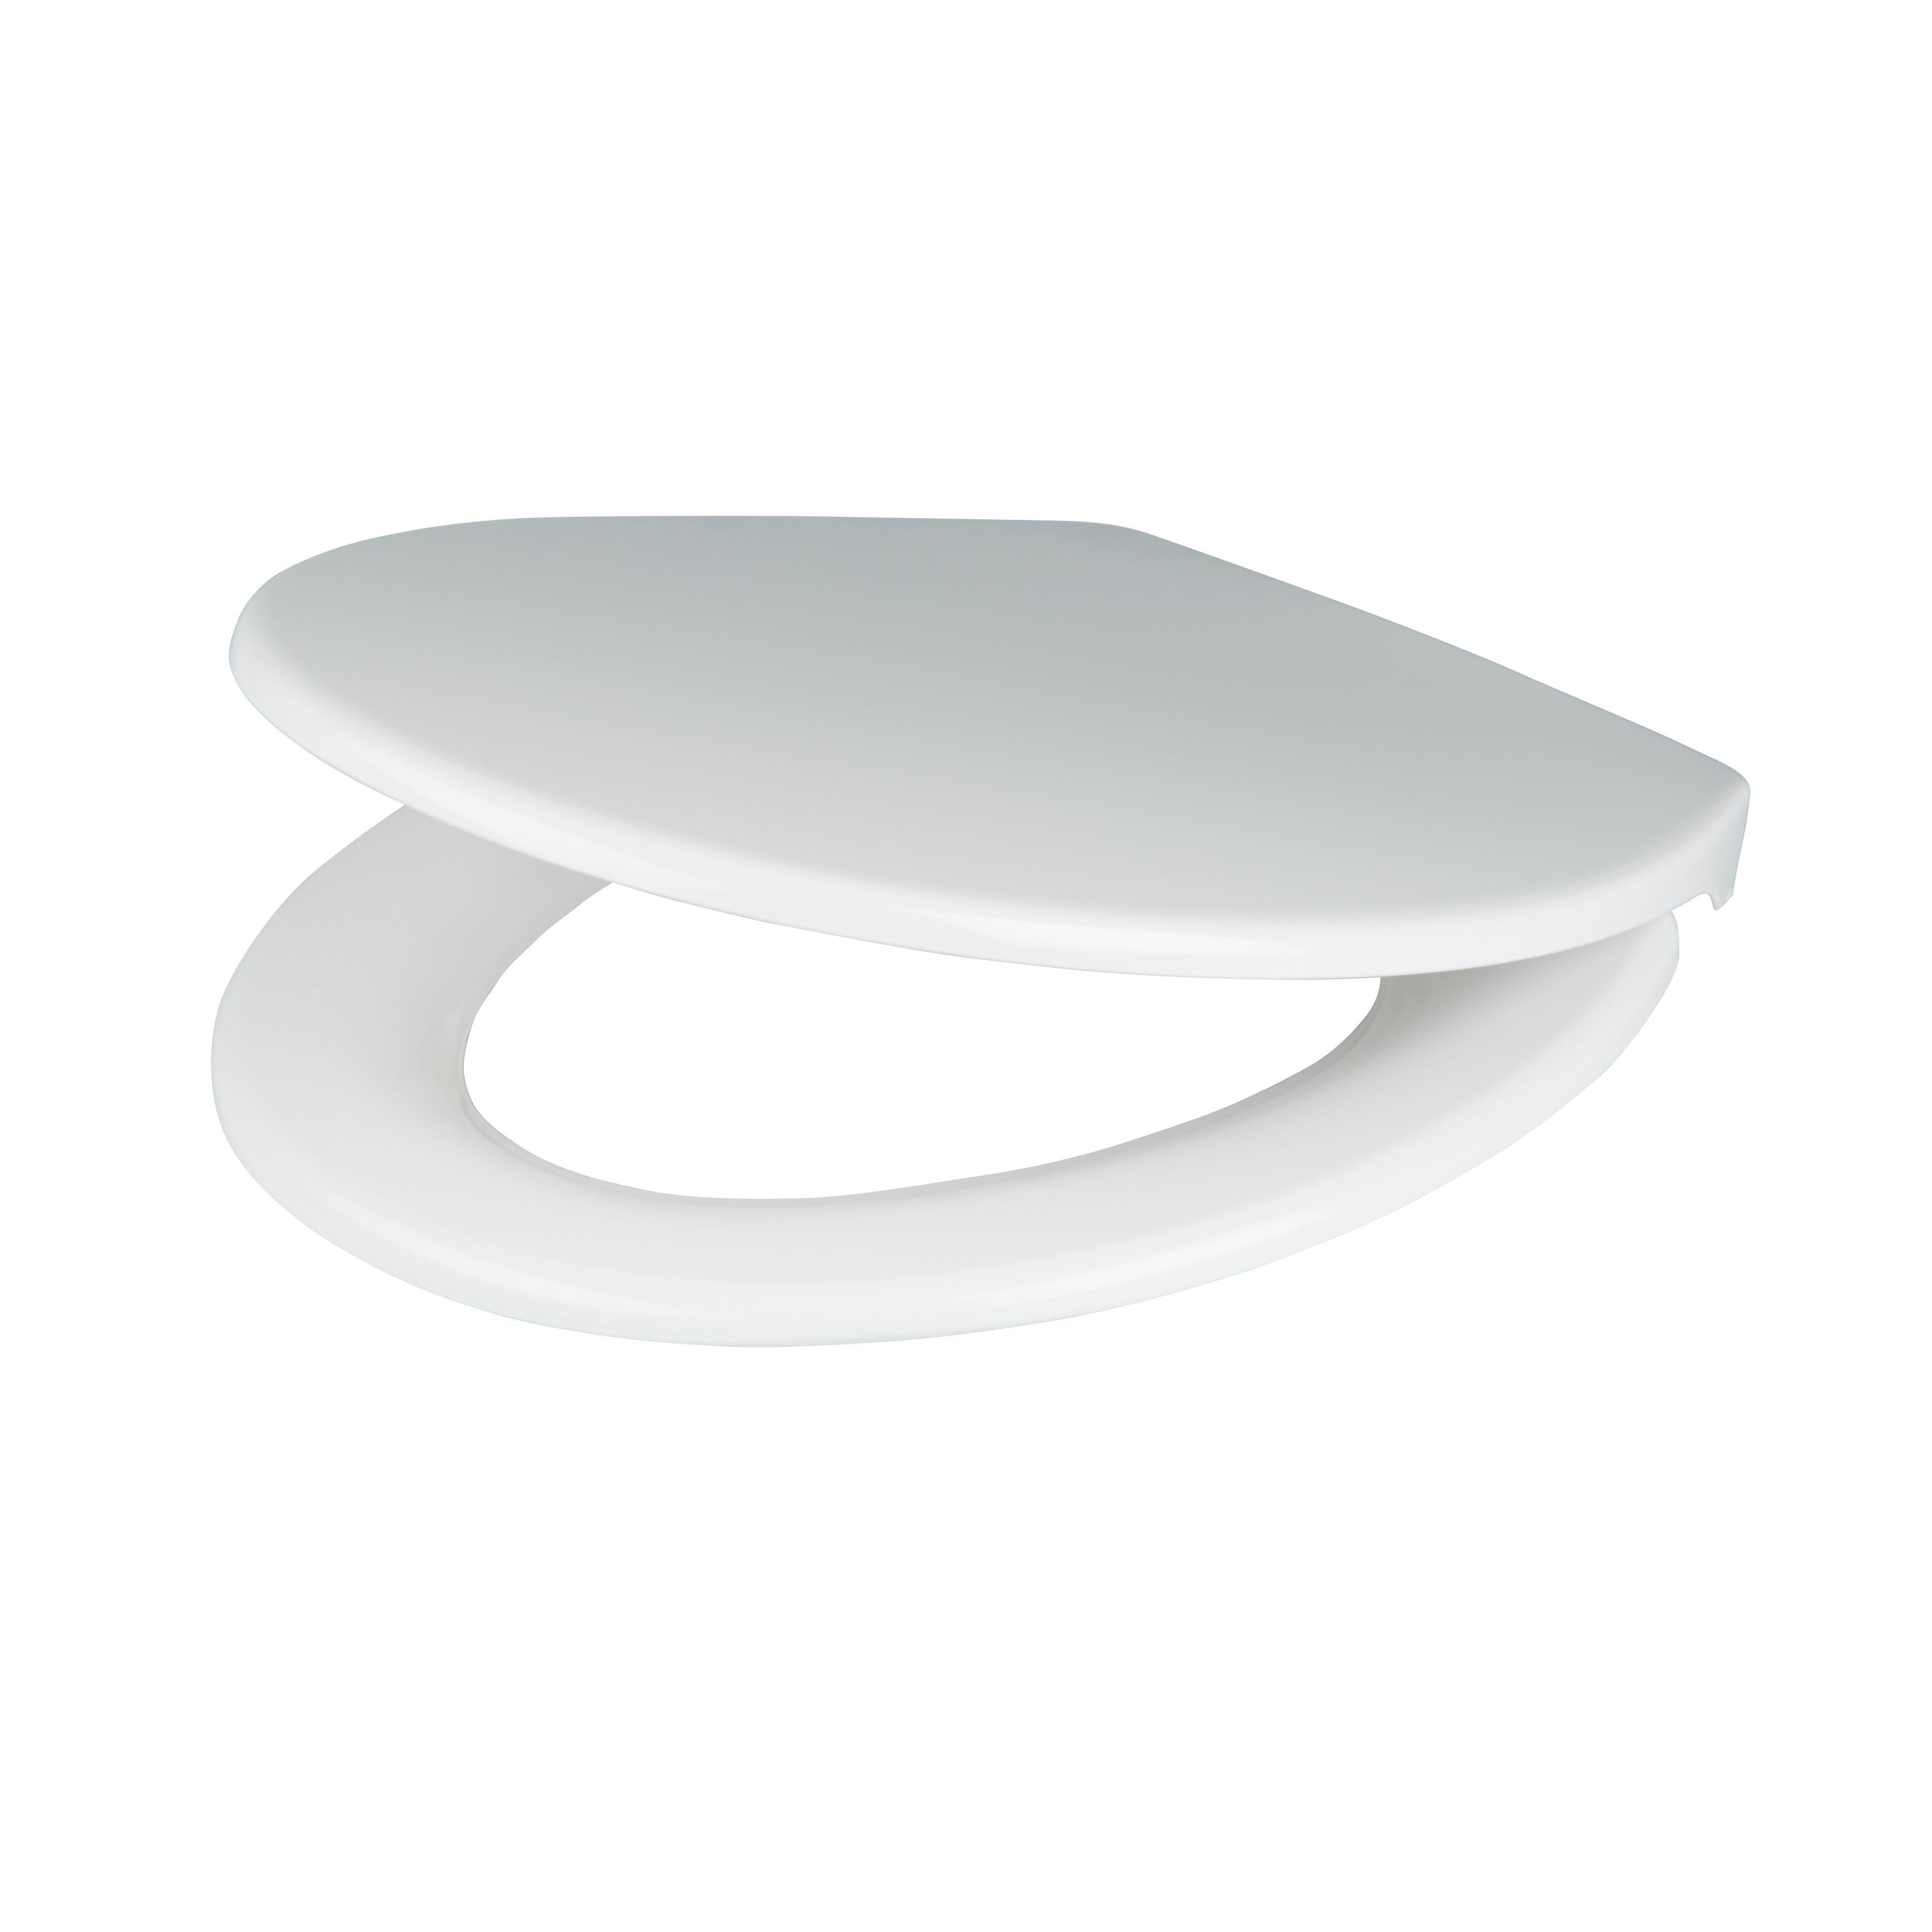 Prime Cooke Lewis Diani White Top Fix Soft Close Toilet Seat Departments Diy At Bq Creativecarmelina Interior Chair Design Creativecarmelinacom